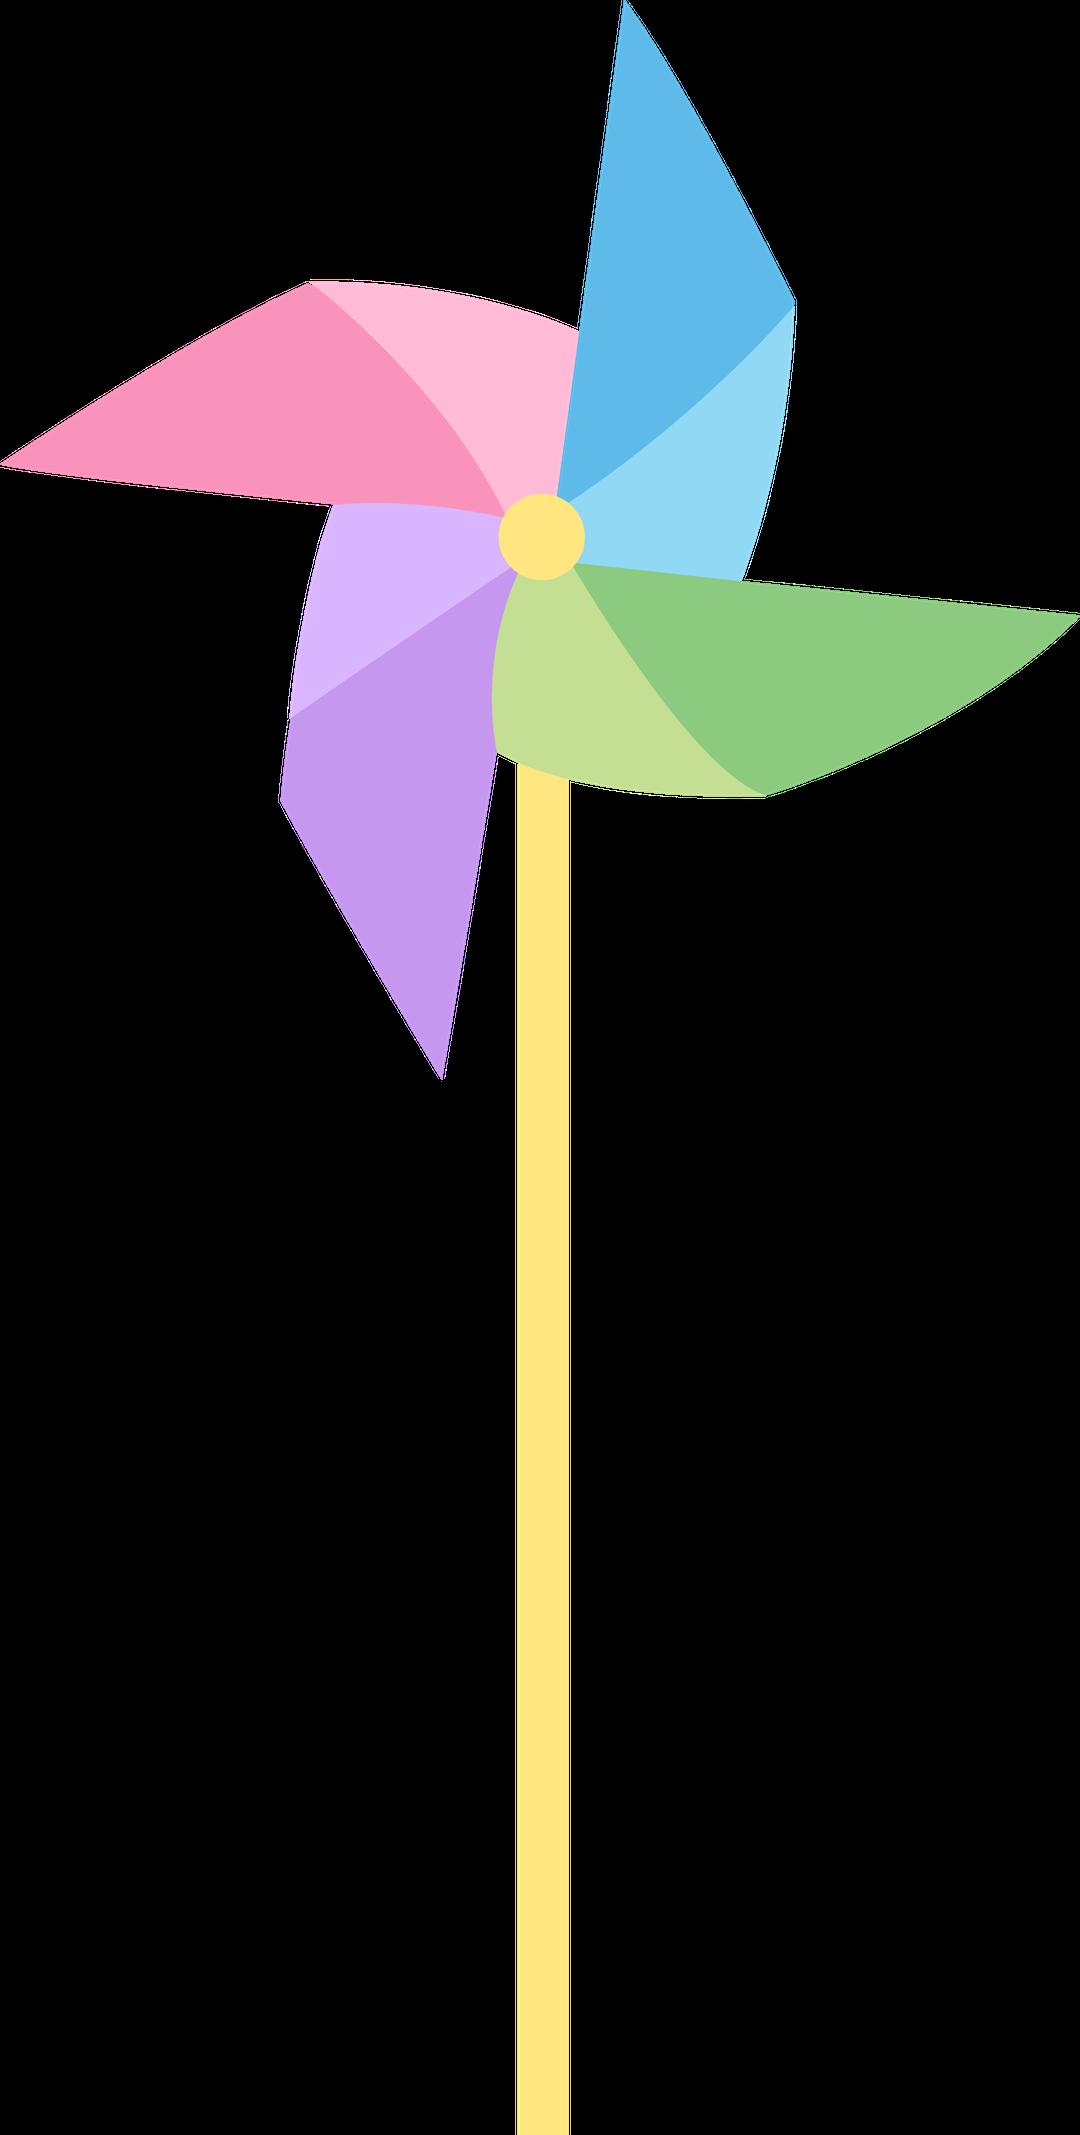 1080x2135 Pastel Colored Pinwheel Free Clip Art Toy ~ Idolza